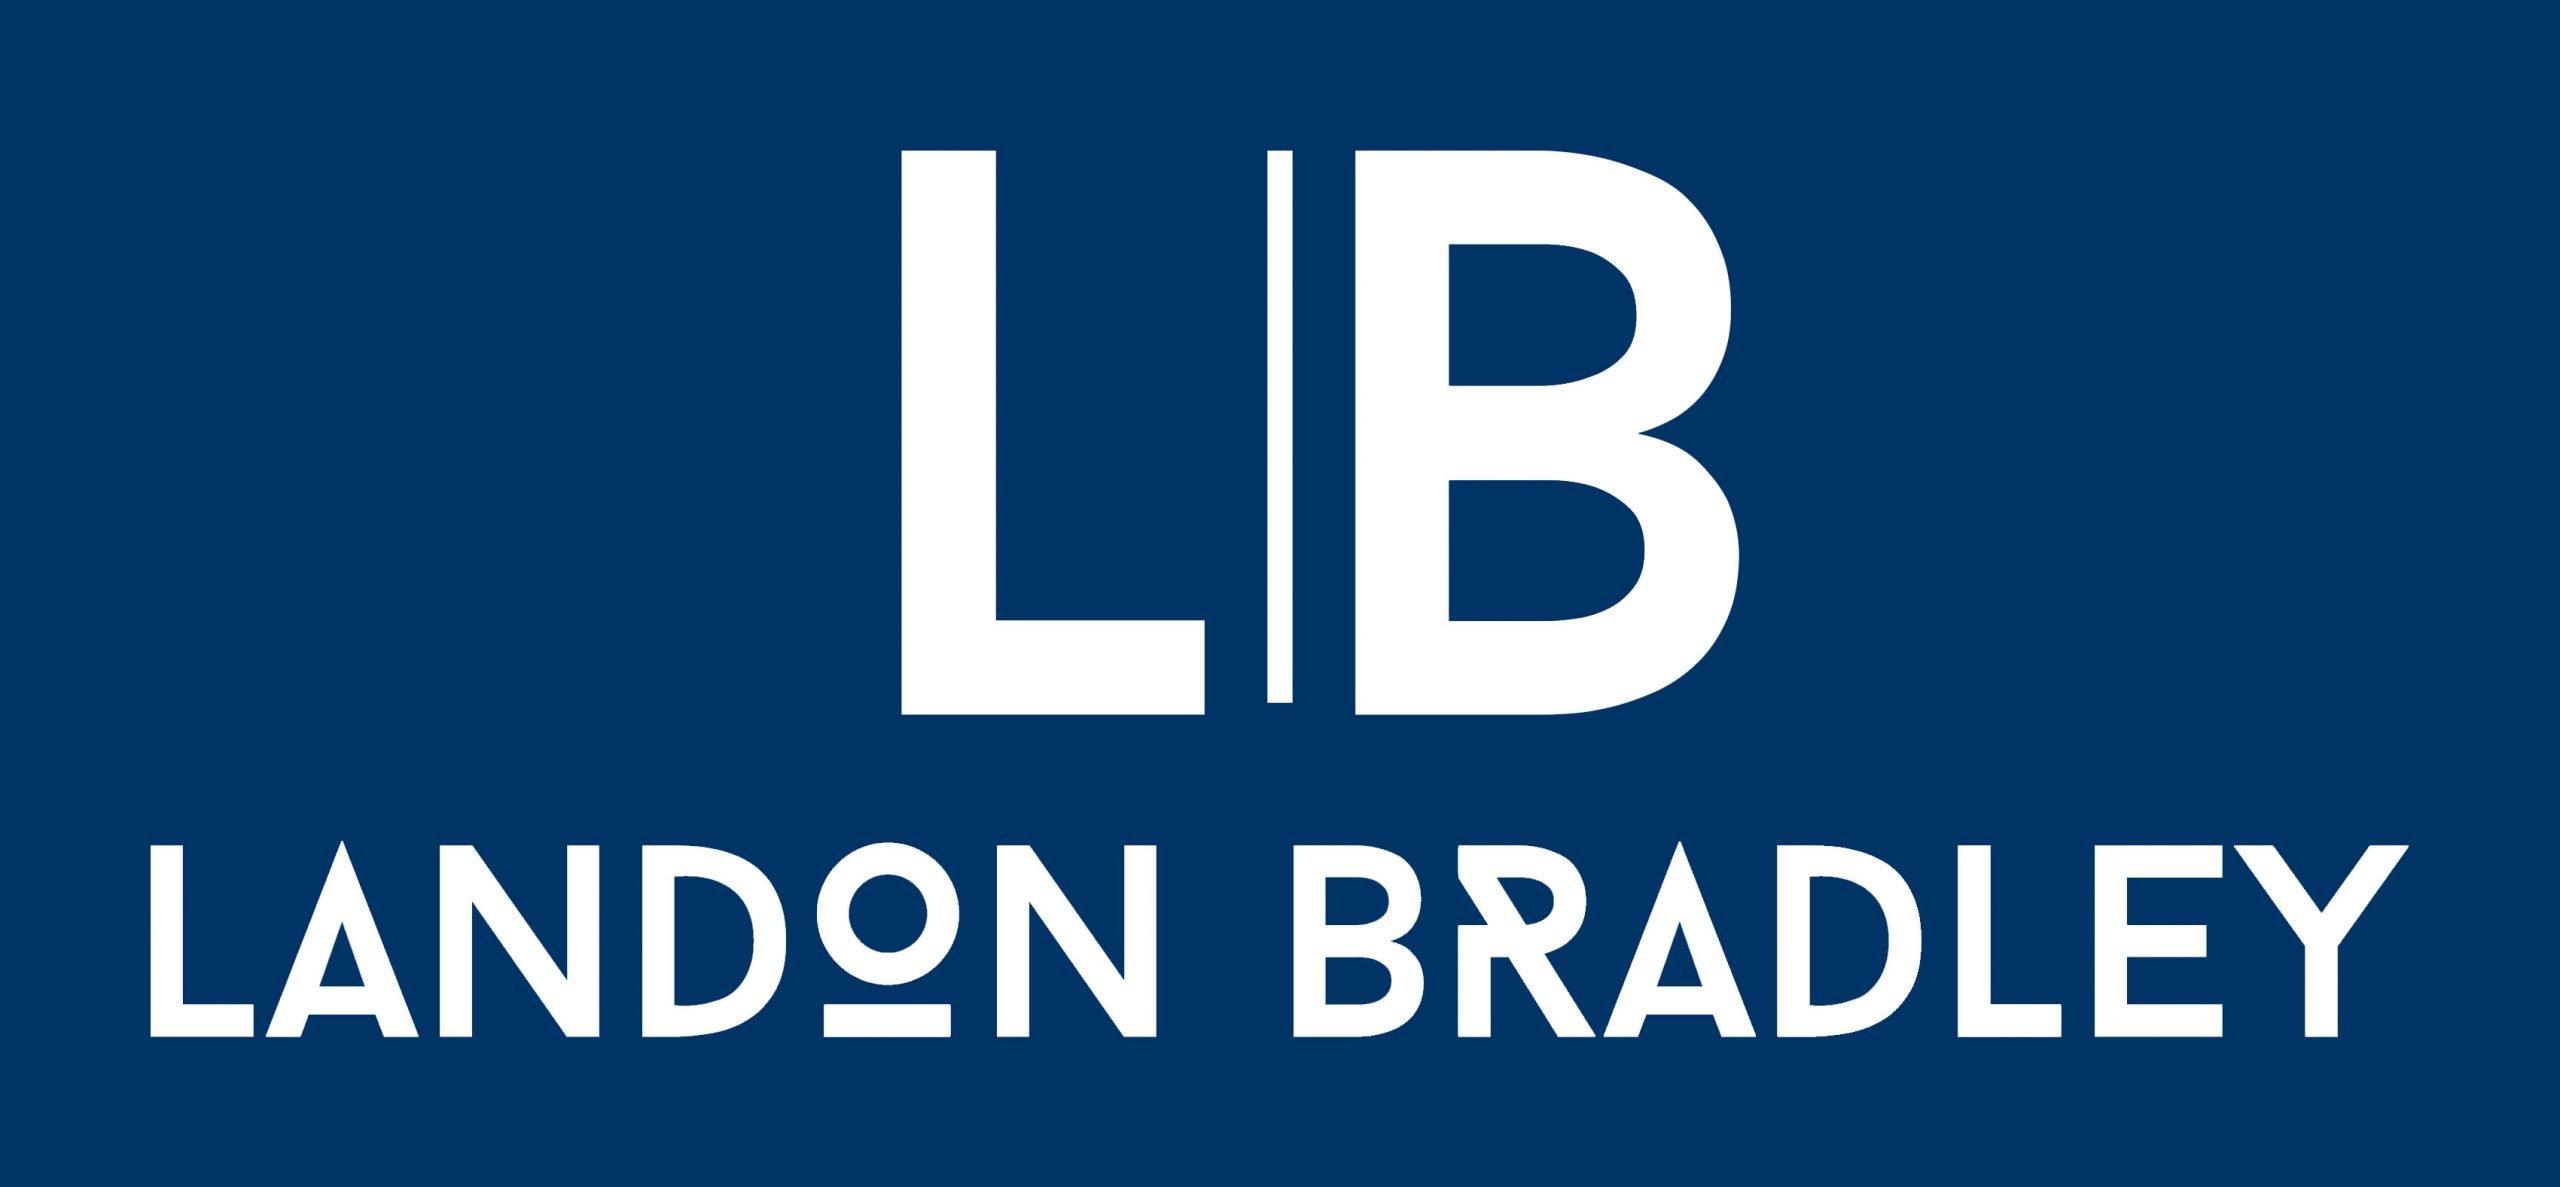 Landon Bradley